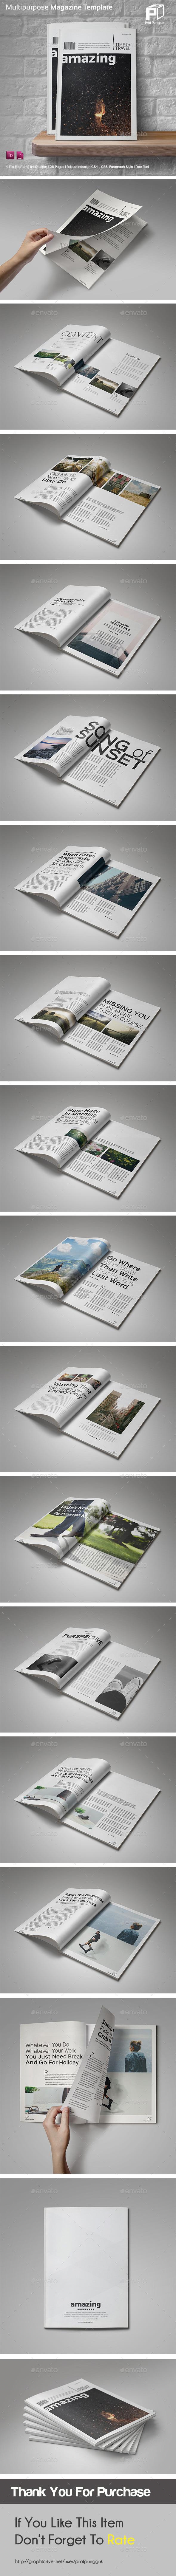 Clean & Simple Magazine Vol.3 - Magazines Print Templates